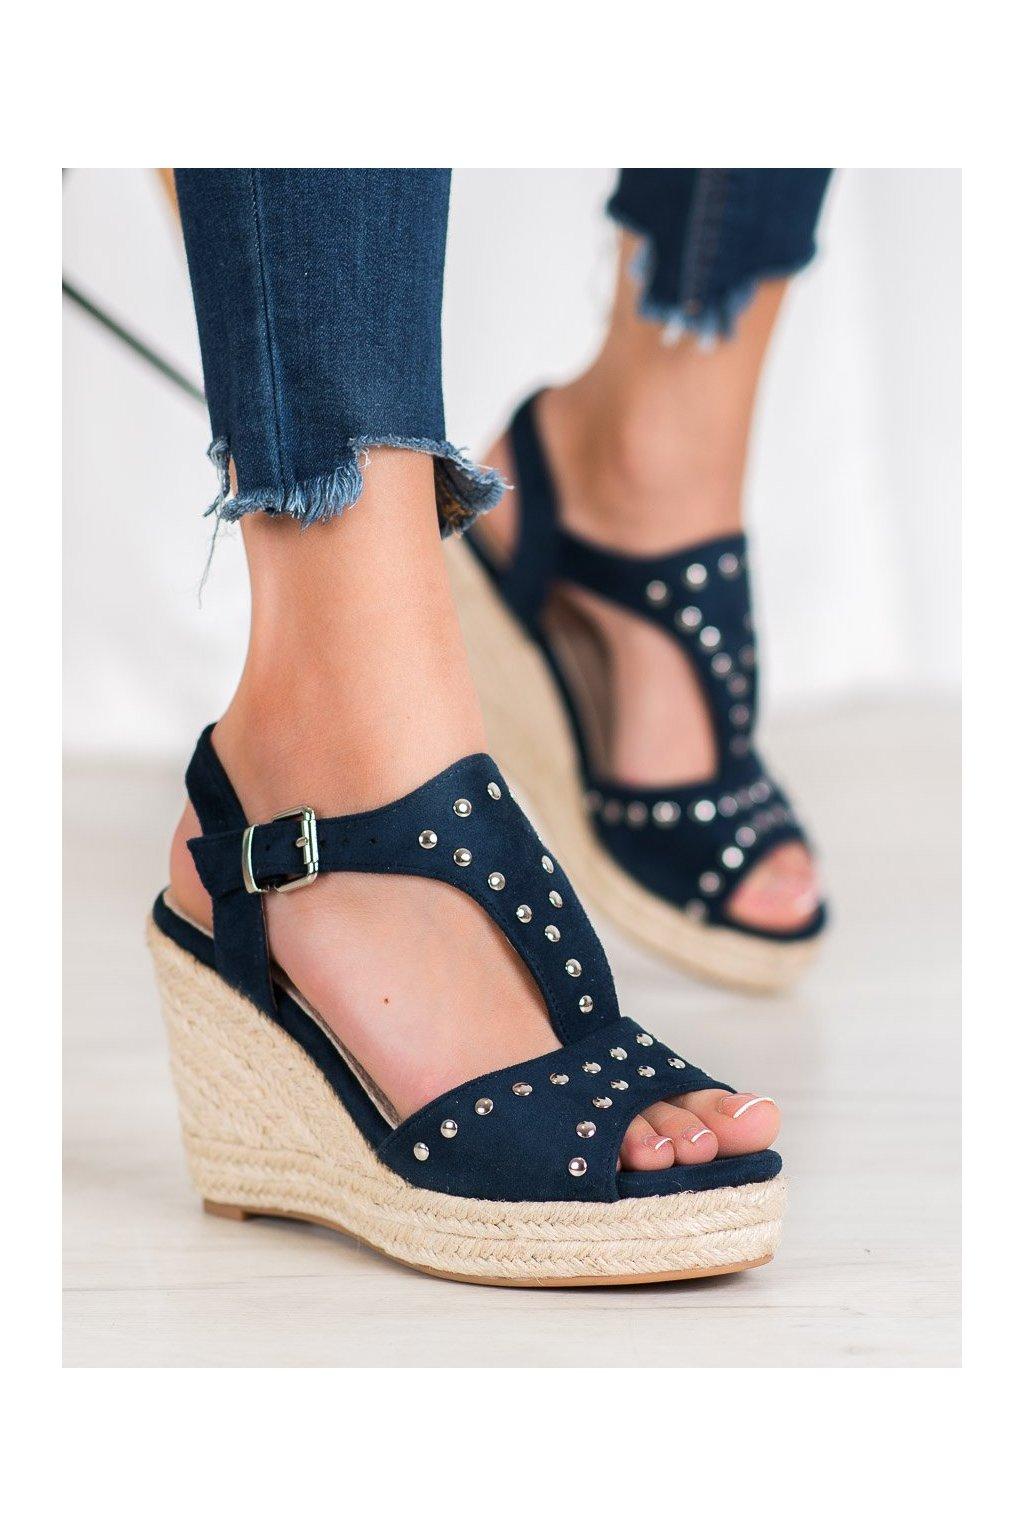 Modré sandále Kylie kod K1952001MA